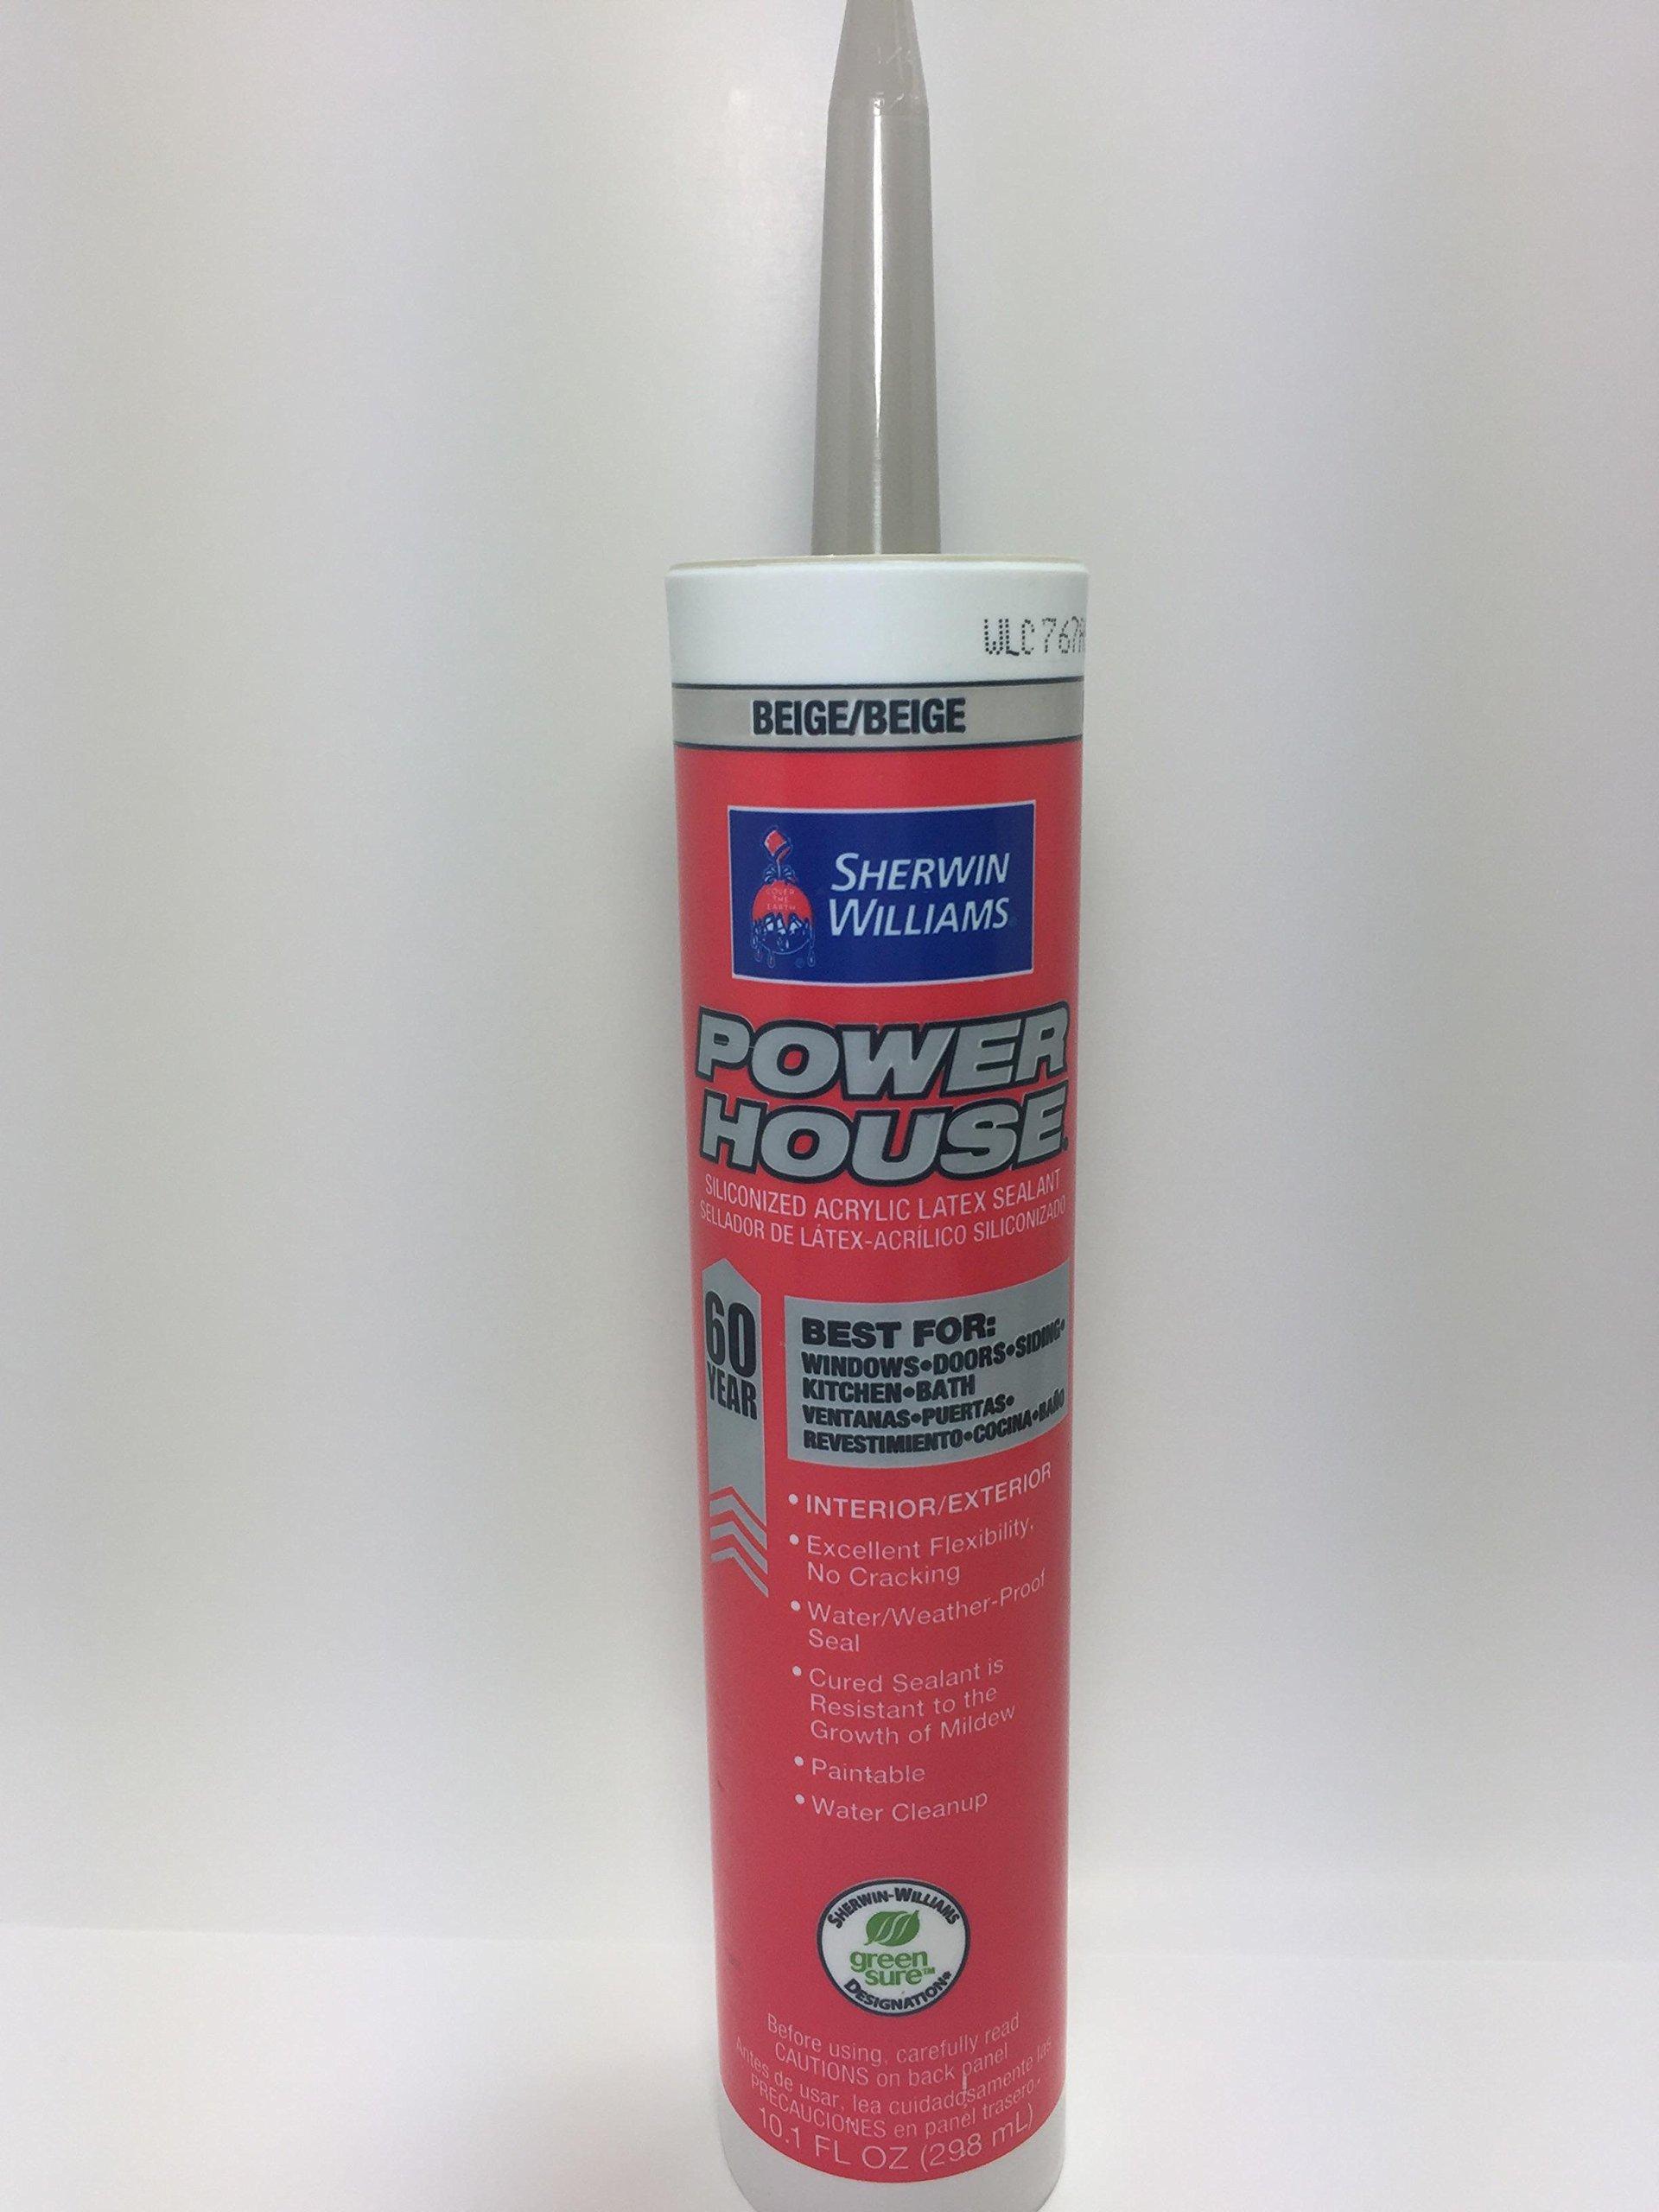 Sherwin Williams Power House Siliconized Acrylic Latex Sealant- 10.1 FL OZ- Beige color- 12 per case